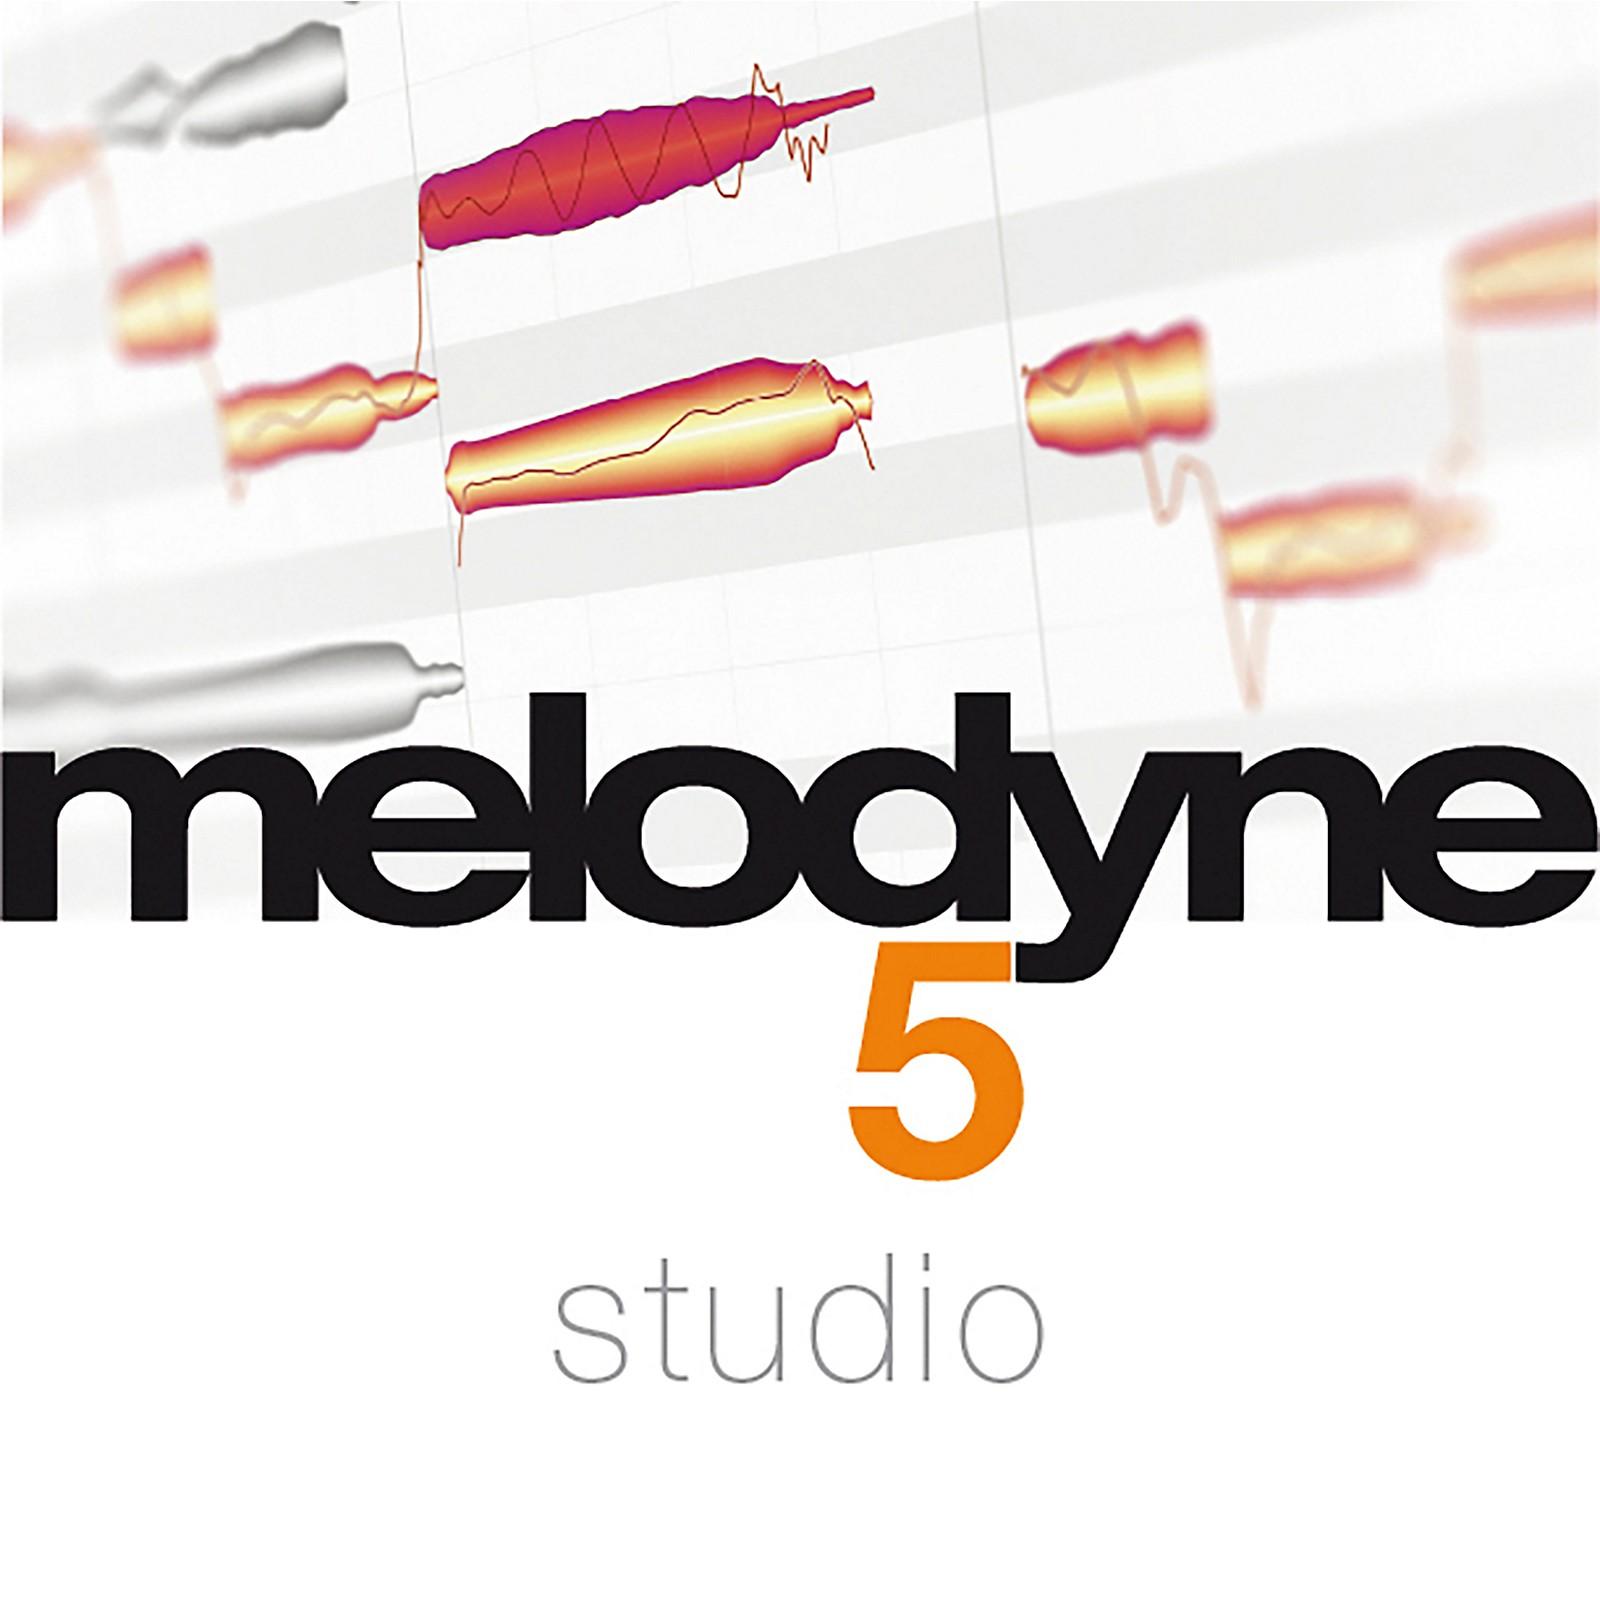 Celemony Melodyne 5 Studio from Essential 4 (Software Download)